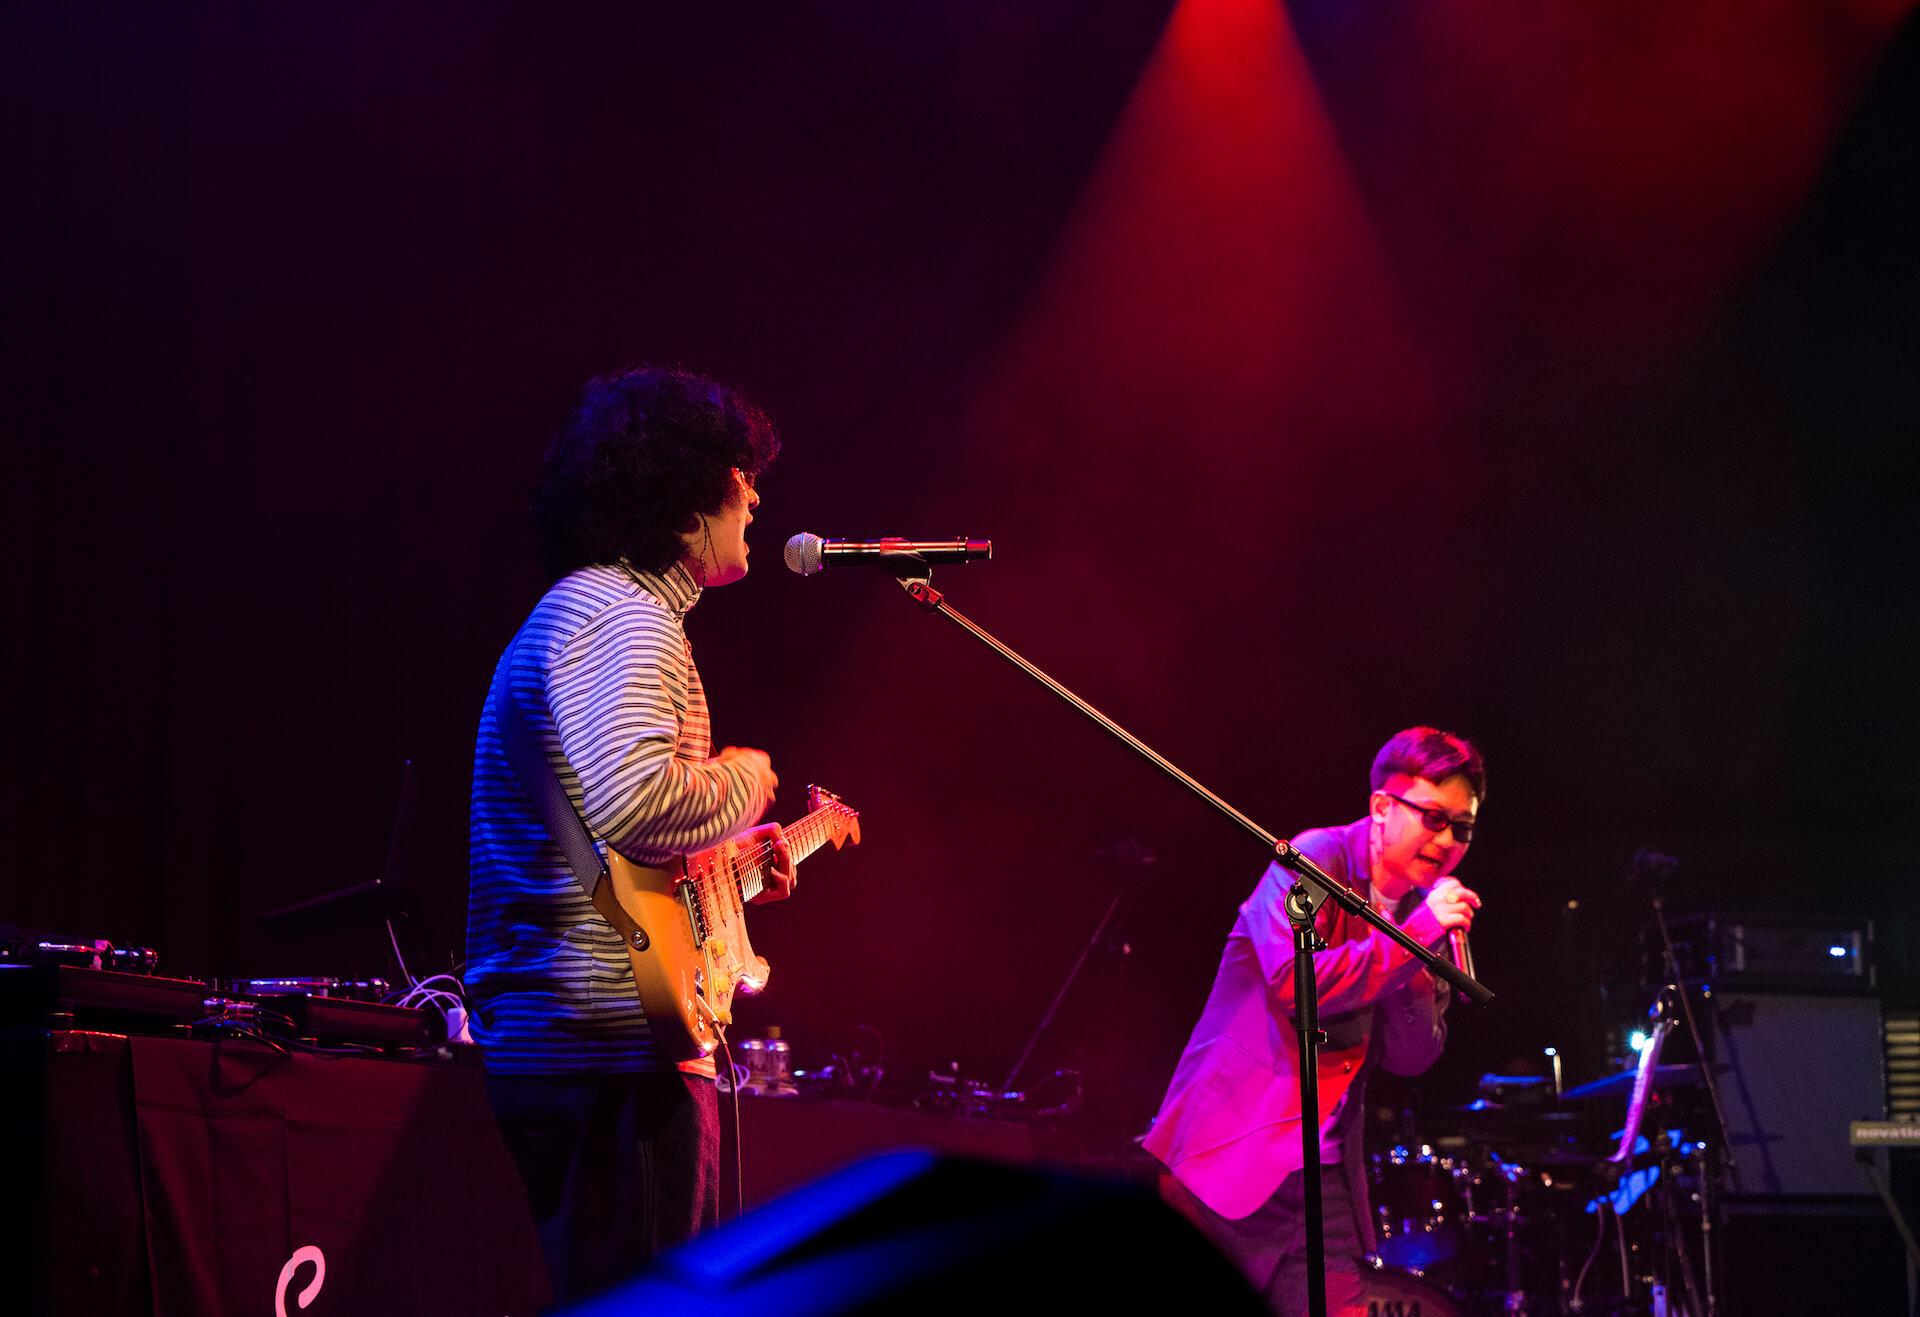 BIM初のビルボードライブ公演のライブレポートが到着!バンドセットでPUNPEE、kZm、STUTSらと共演 music201112_bim_live_9